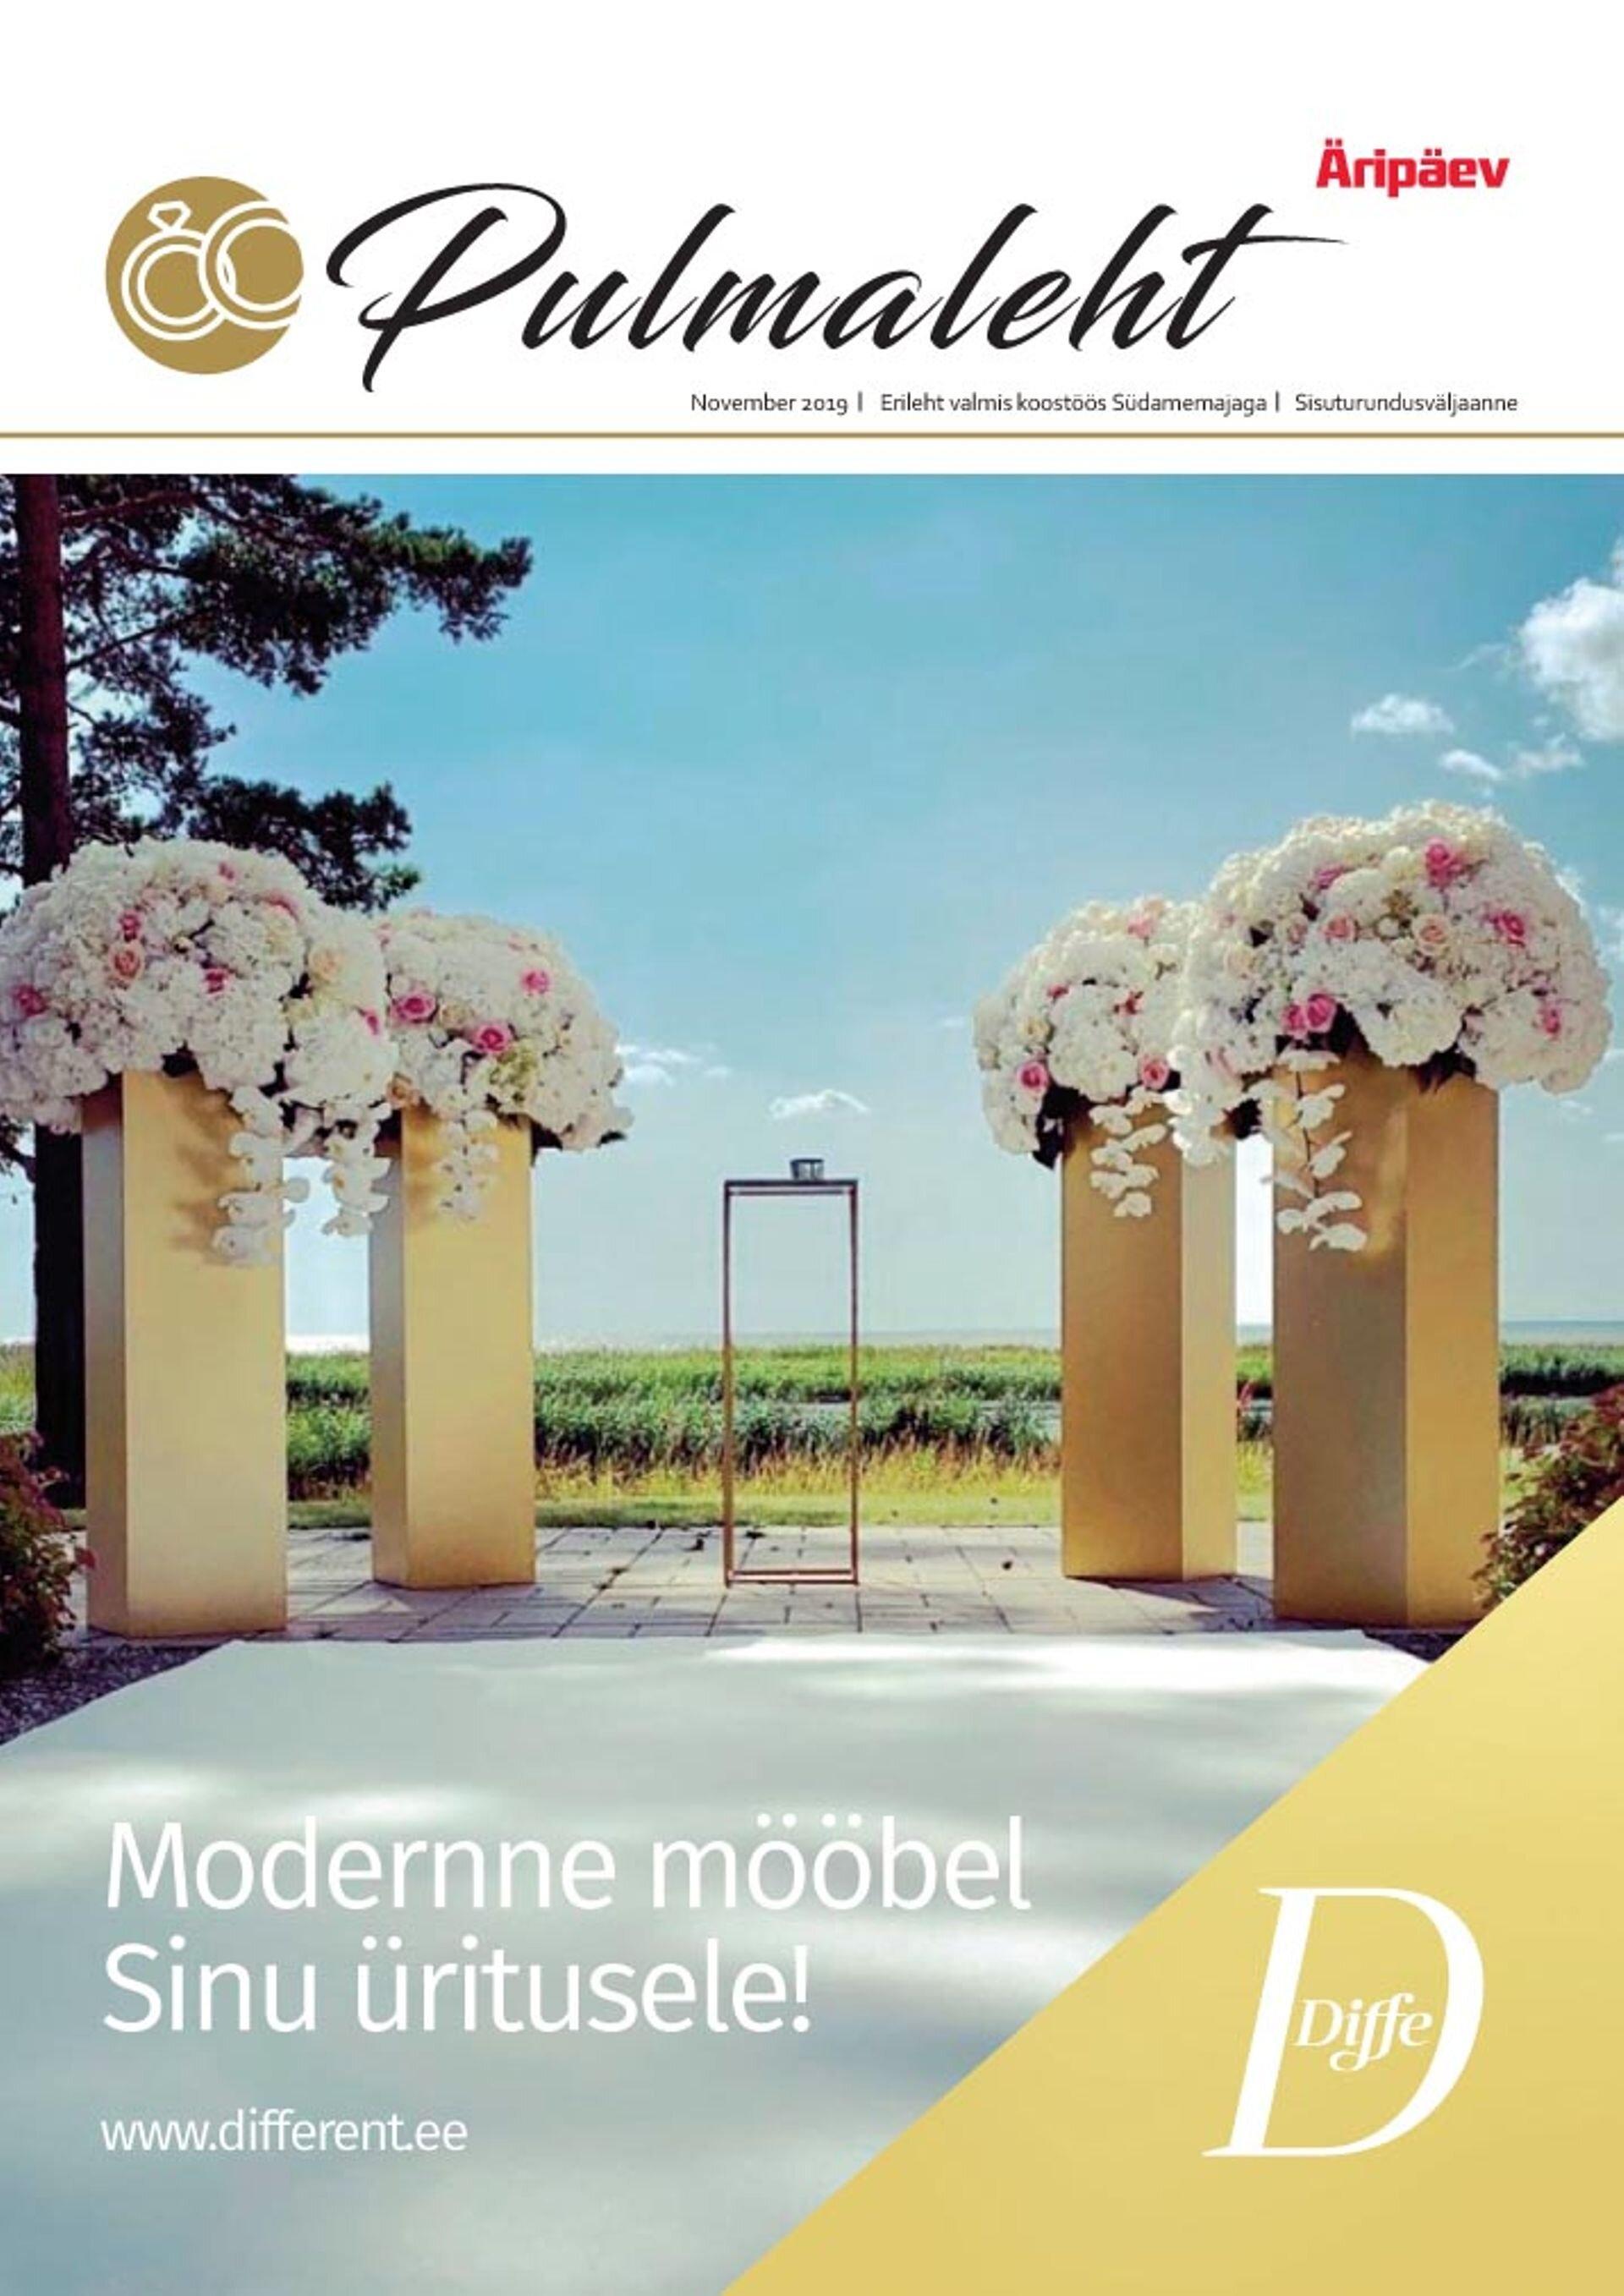 Äripäeva pulmaleht 2019